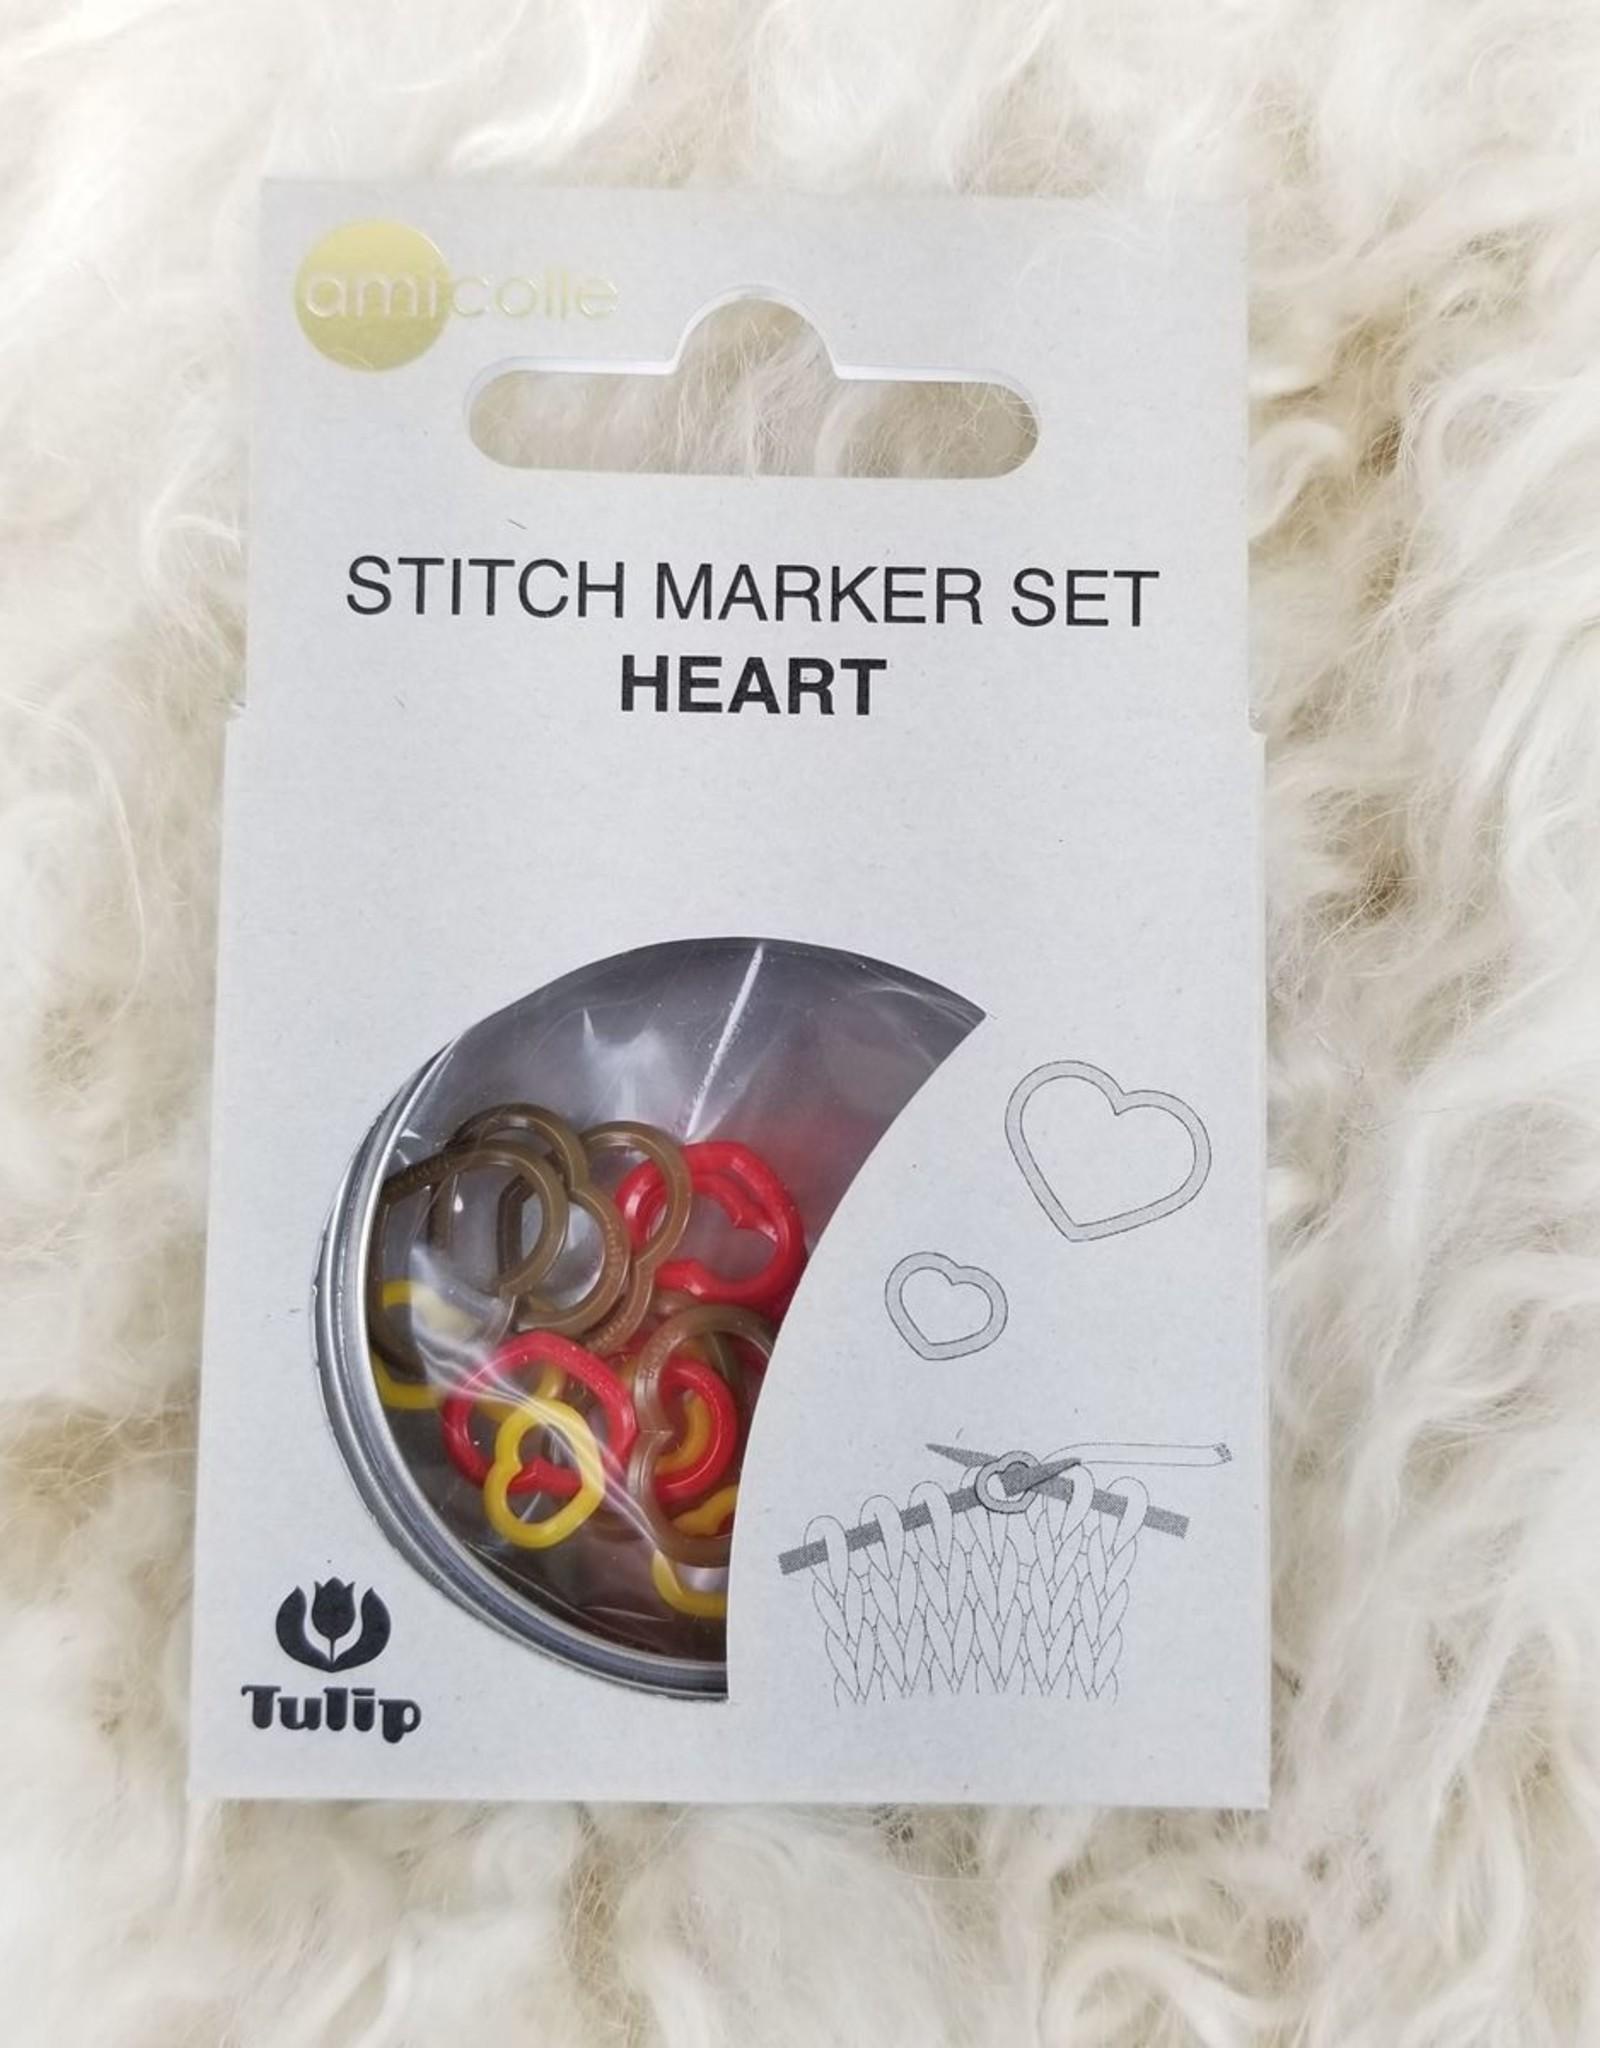 Stitch Marker Set